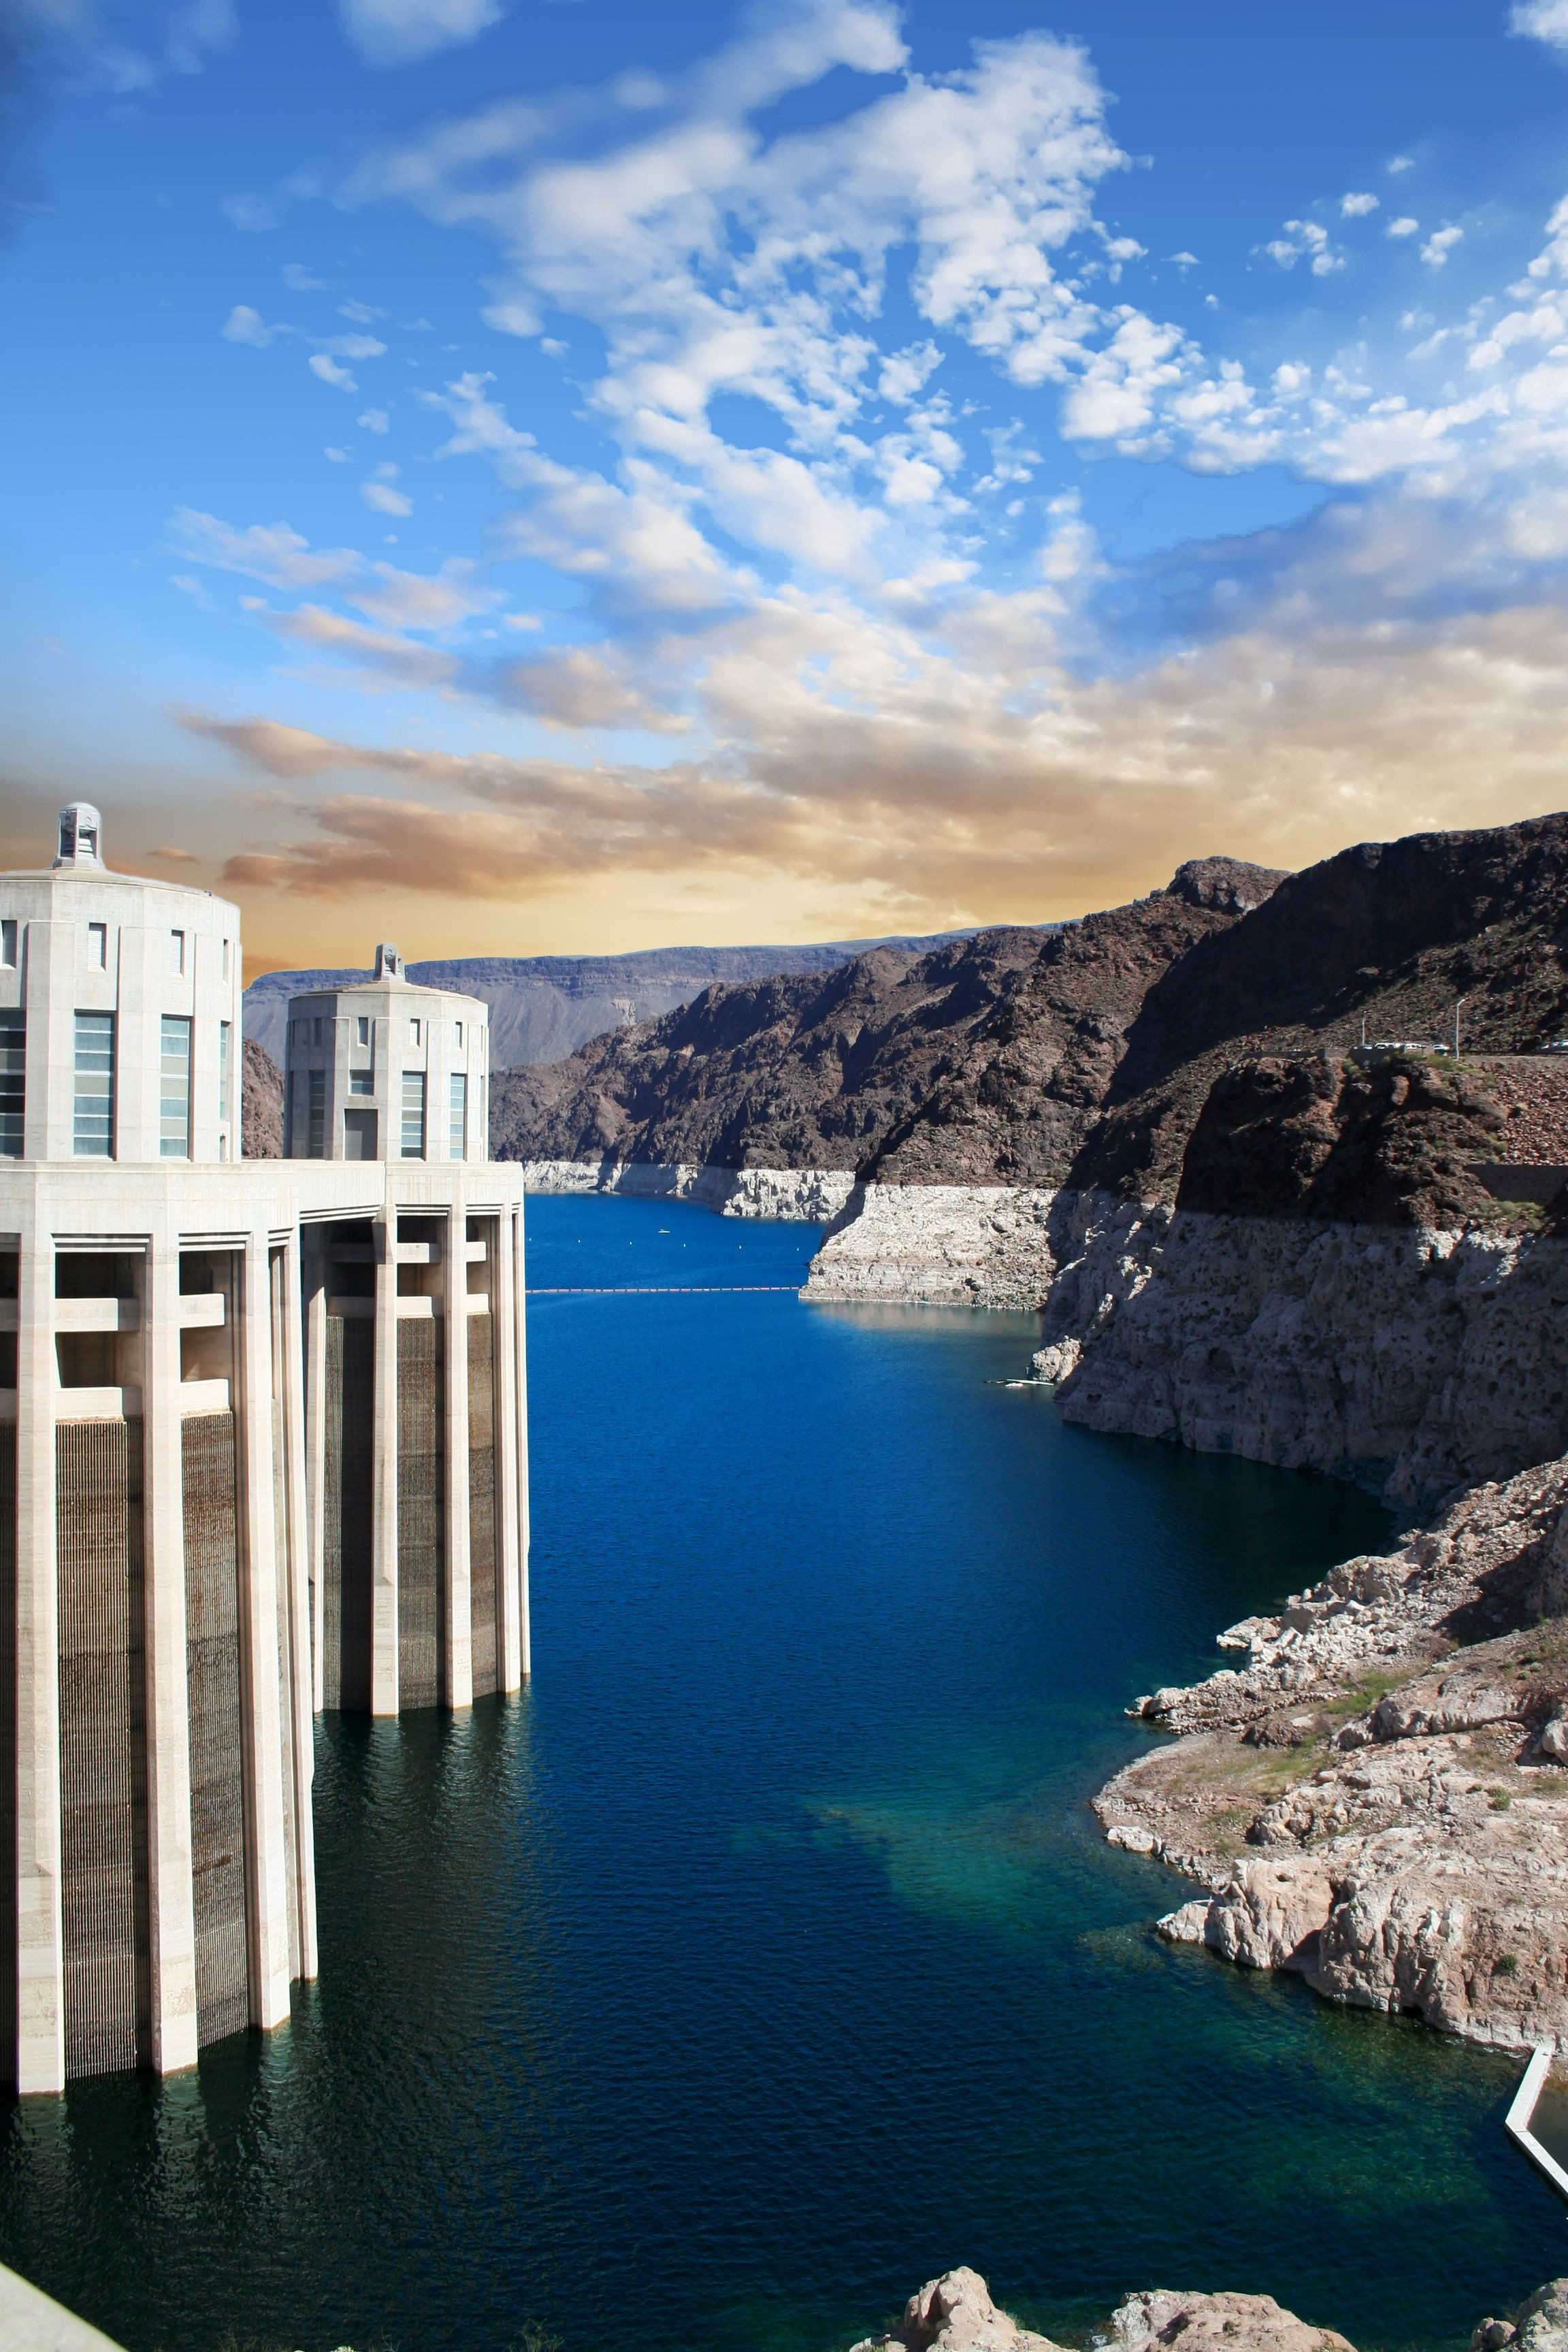 Hoover dam on lake mead near las vegas nevada an